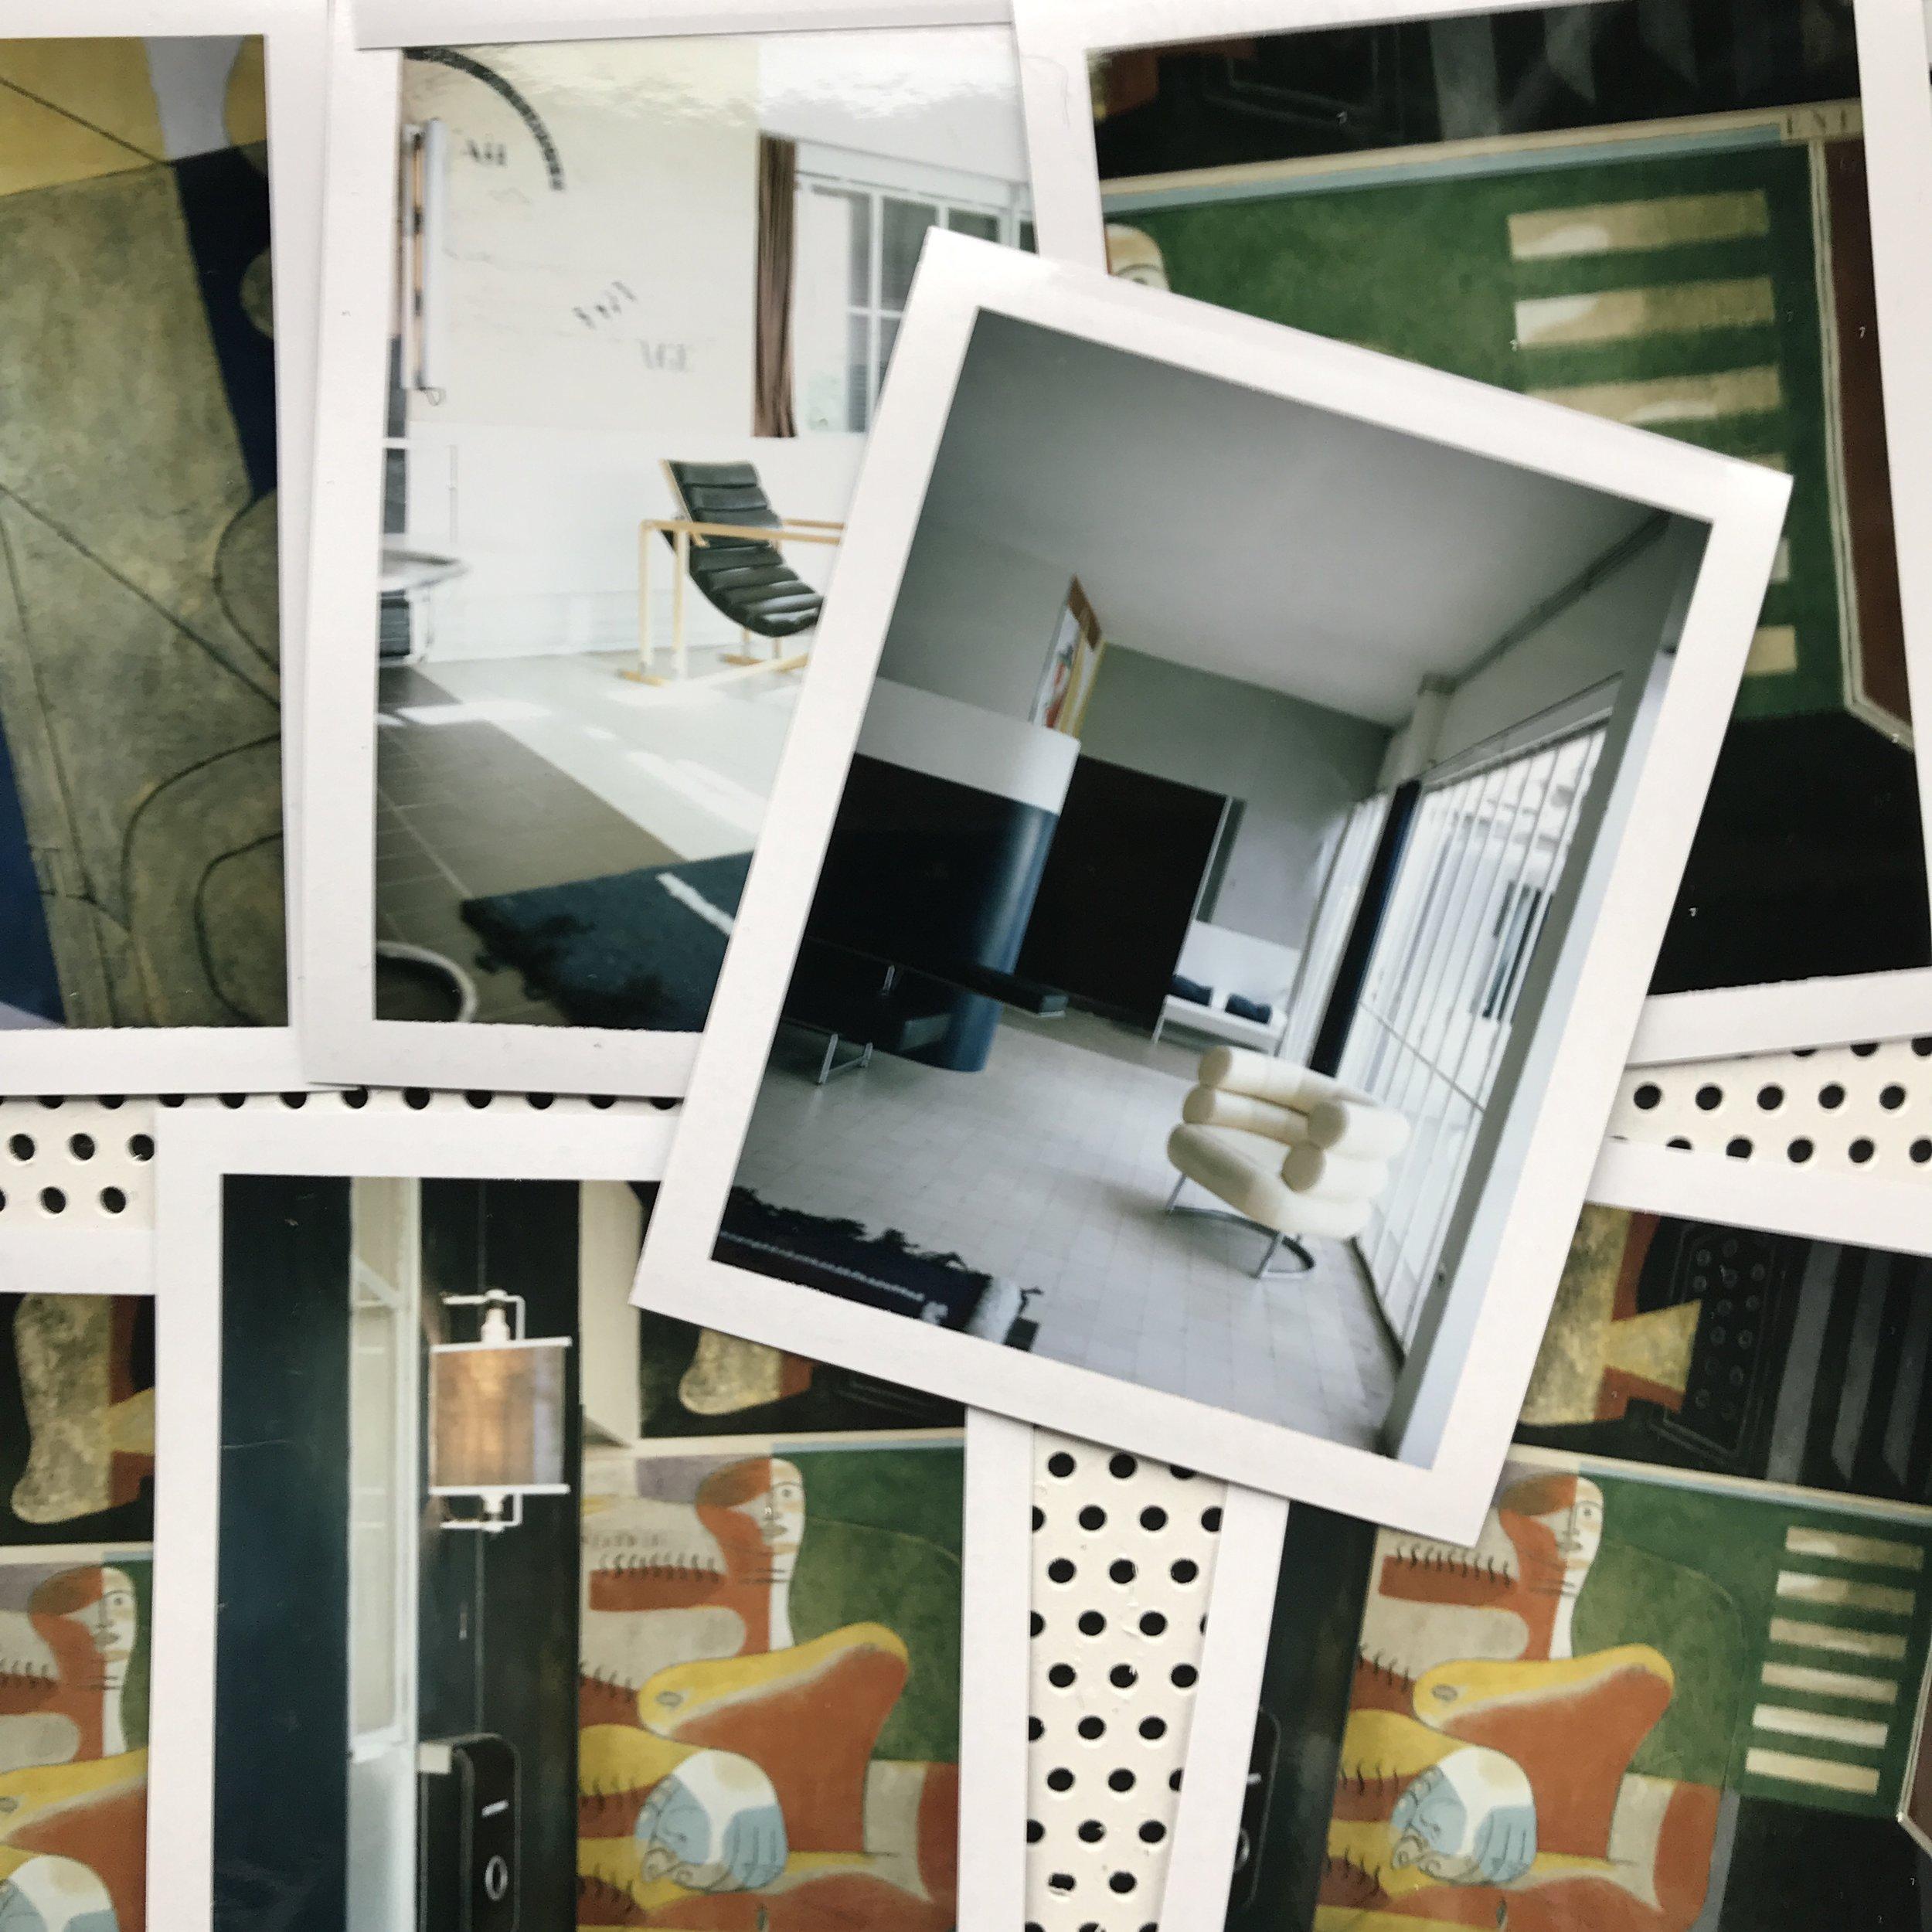 F_Halard Polaroid_E-1027_01.JPG